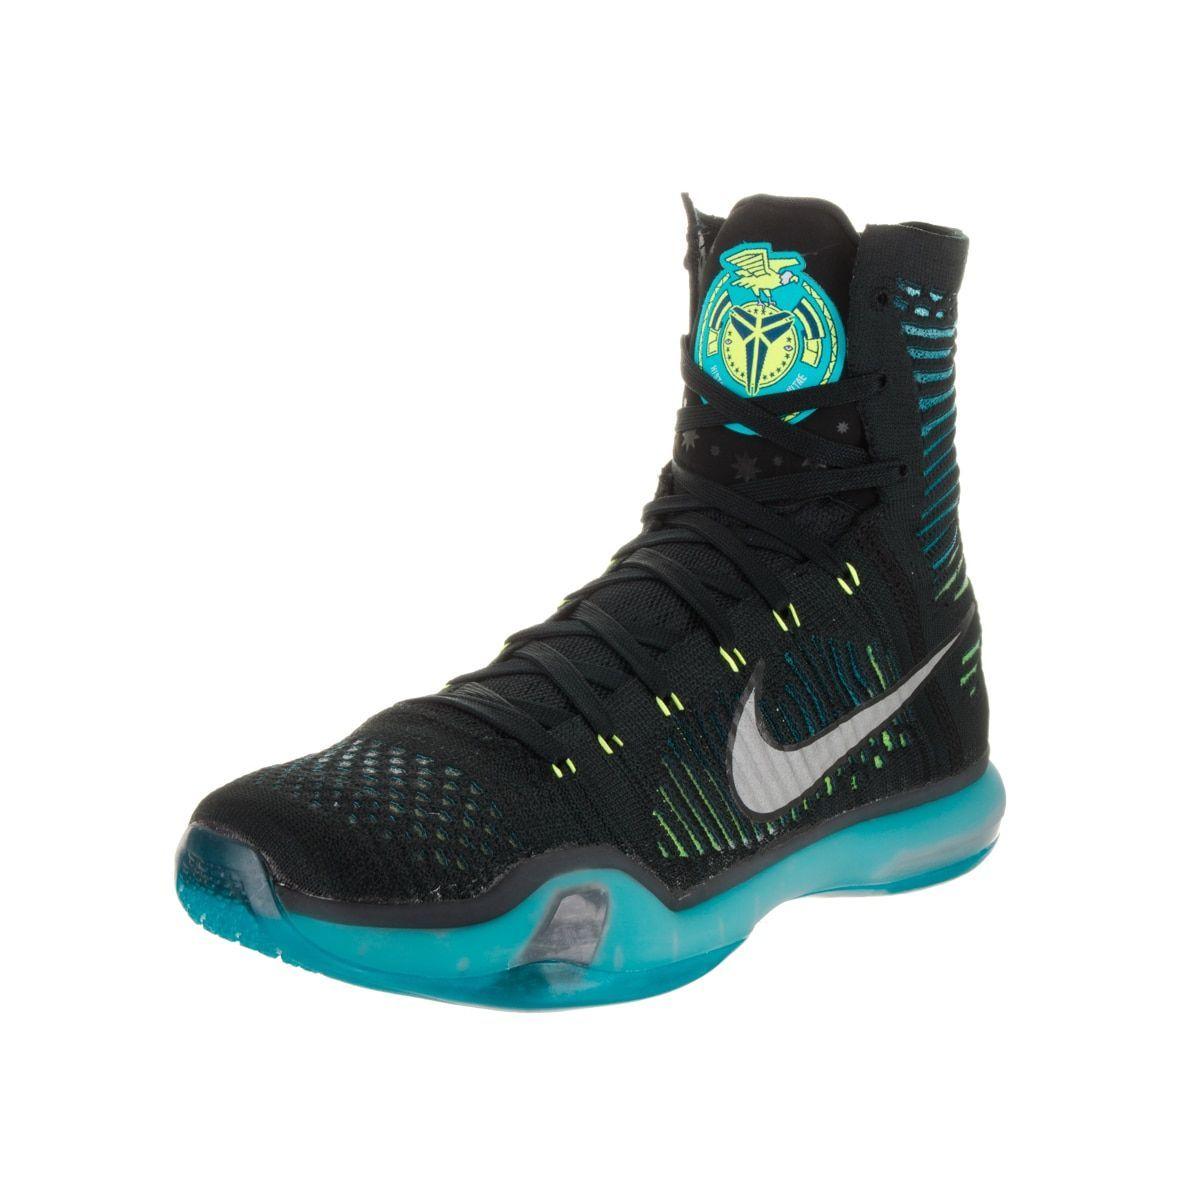 low priced 1bdba 009dc Nike Men s Kobe X Elite and Blue High-top Basketball Shoes